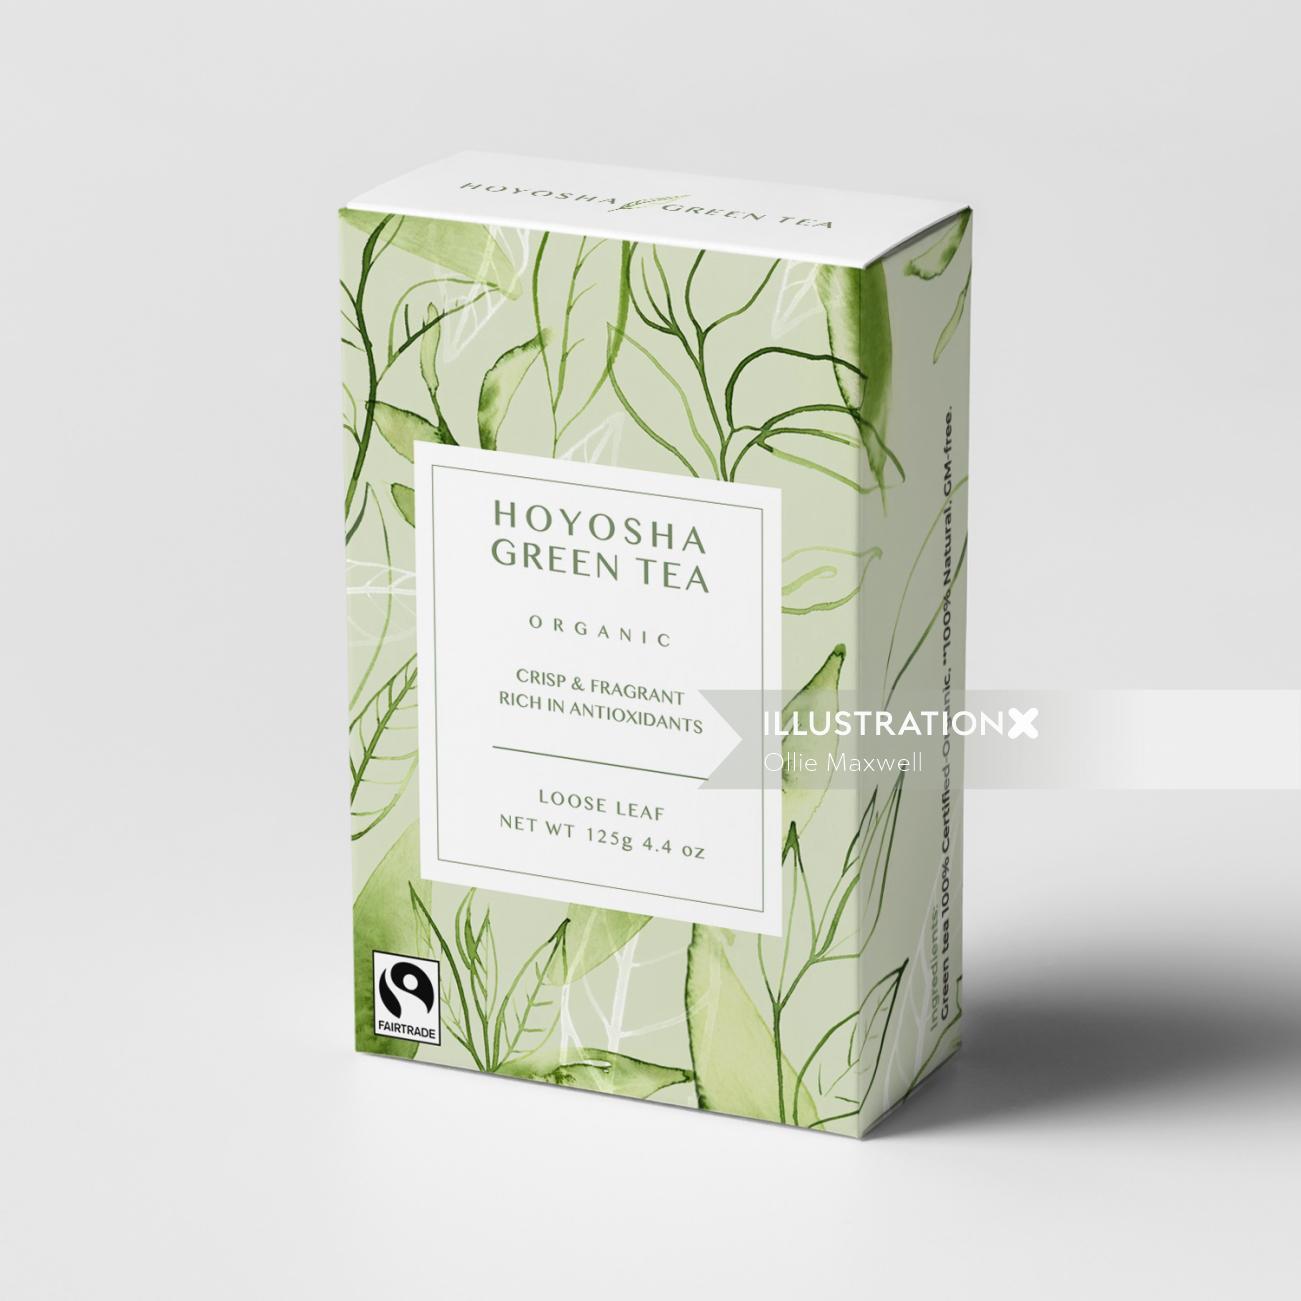 watercolour art of Green tea box packaging